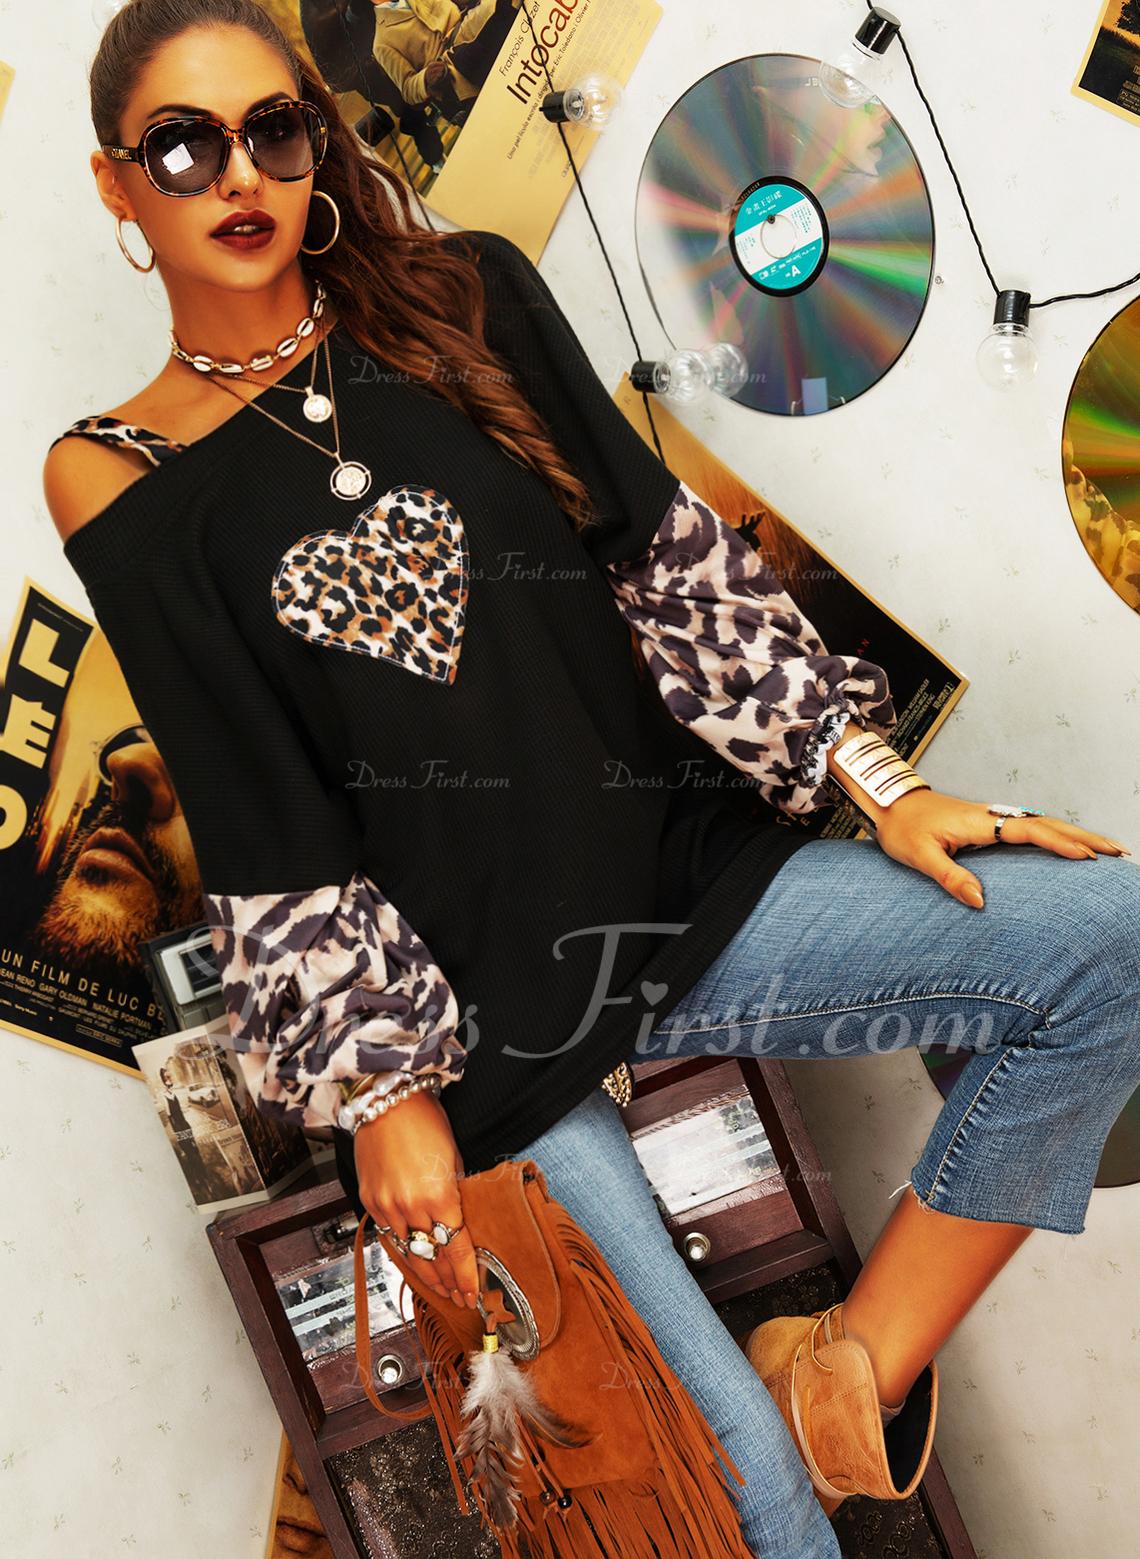 leopardo Stampa Una spalla Manica a lanterna Maniche lunghe Casuale Camicie